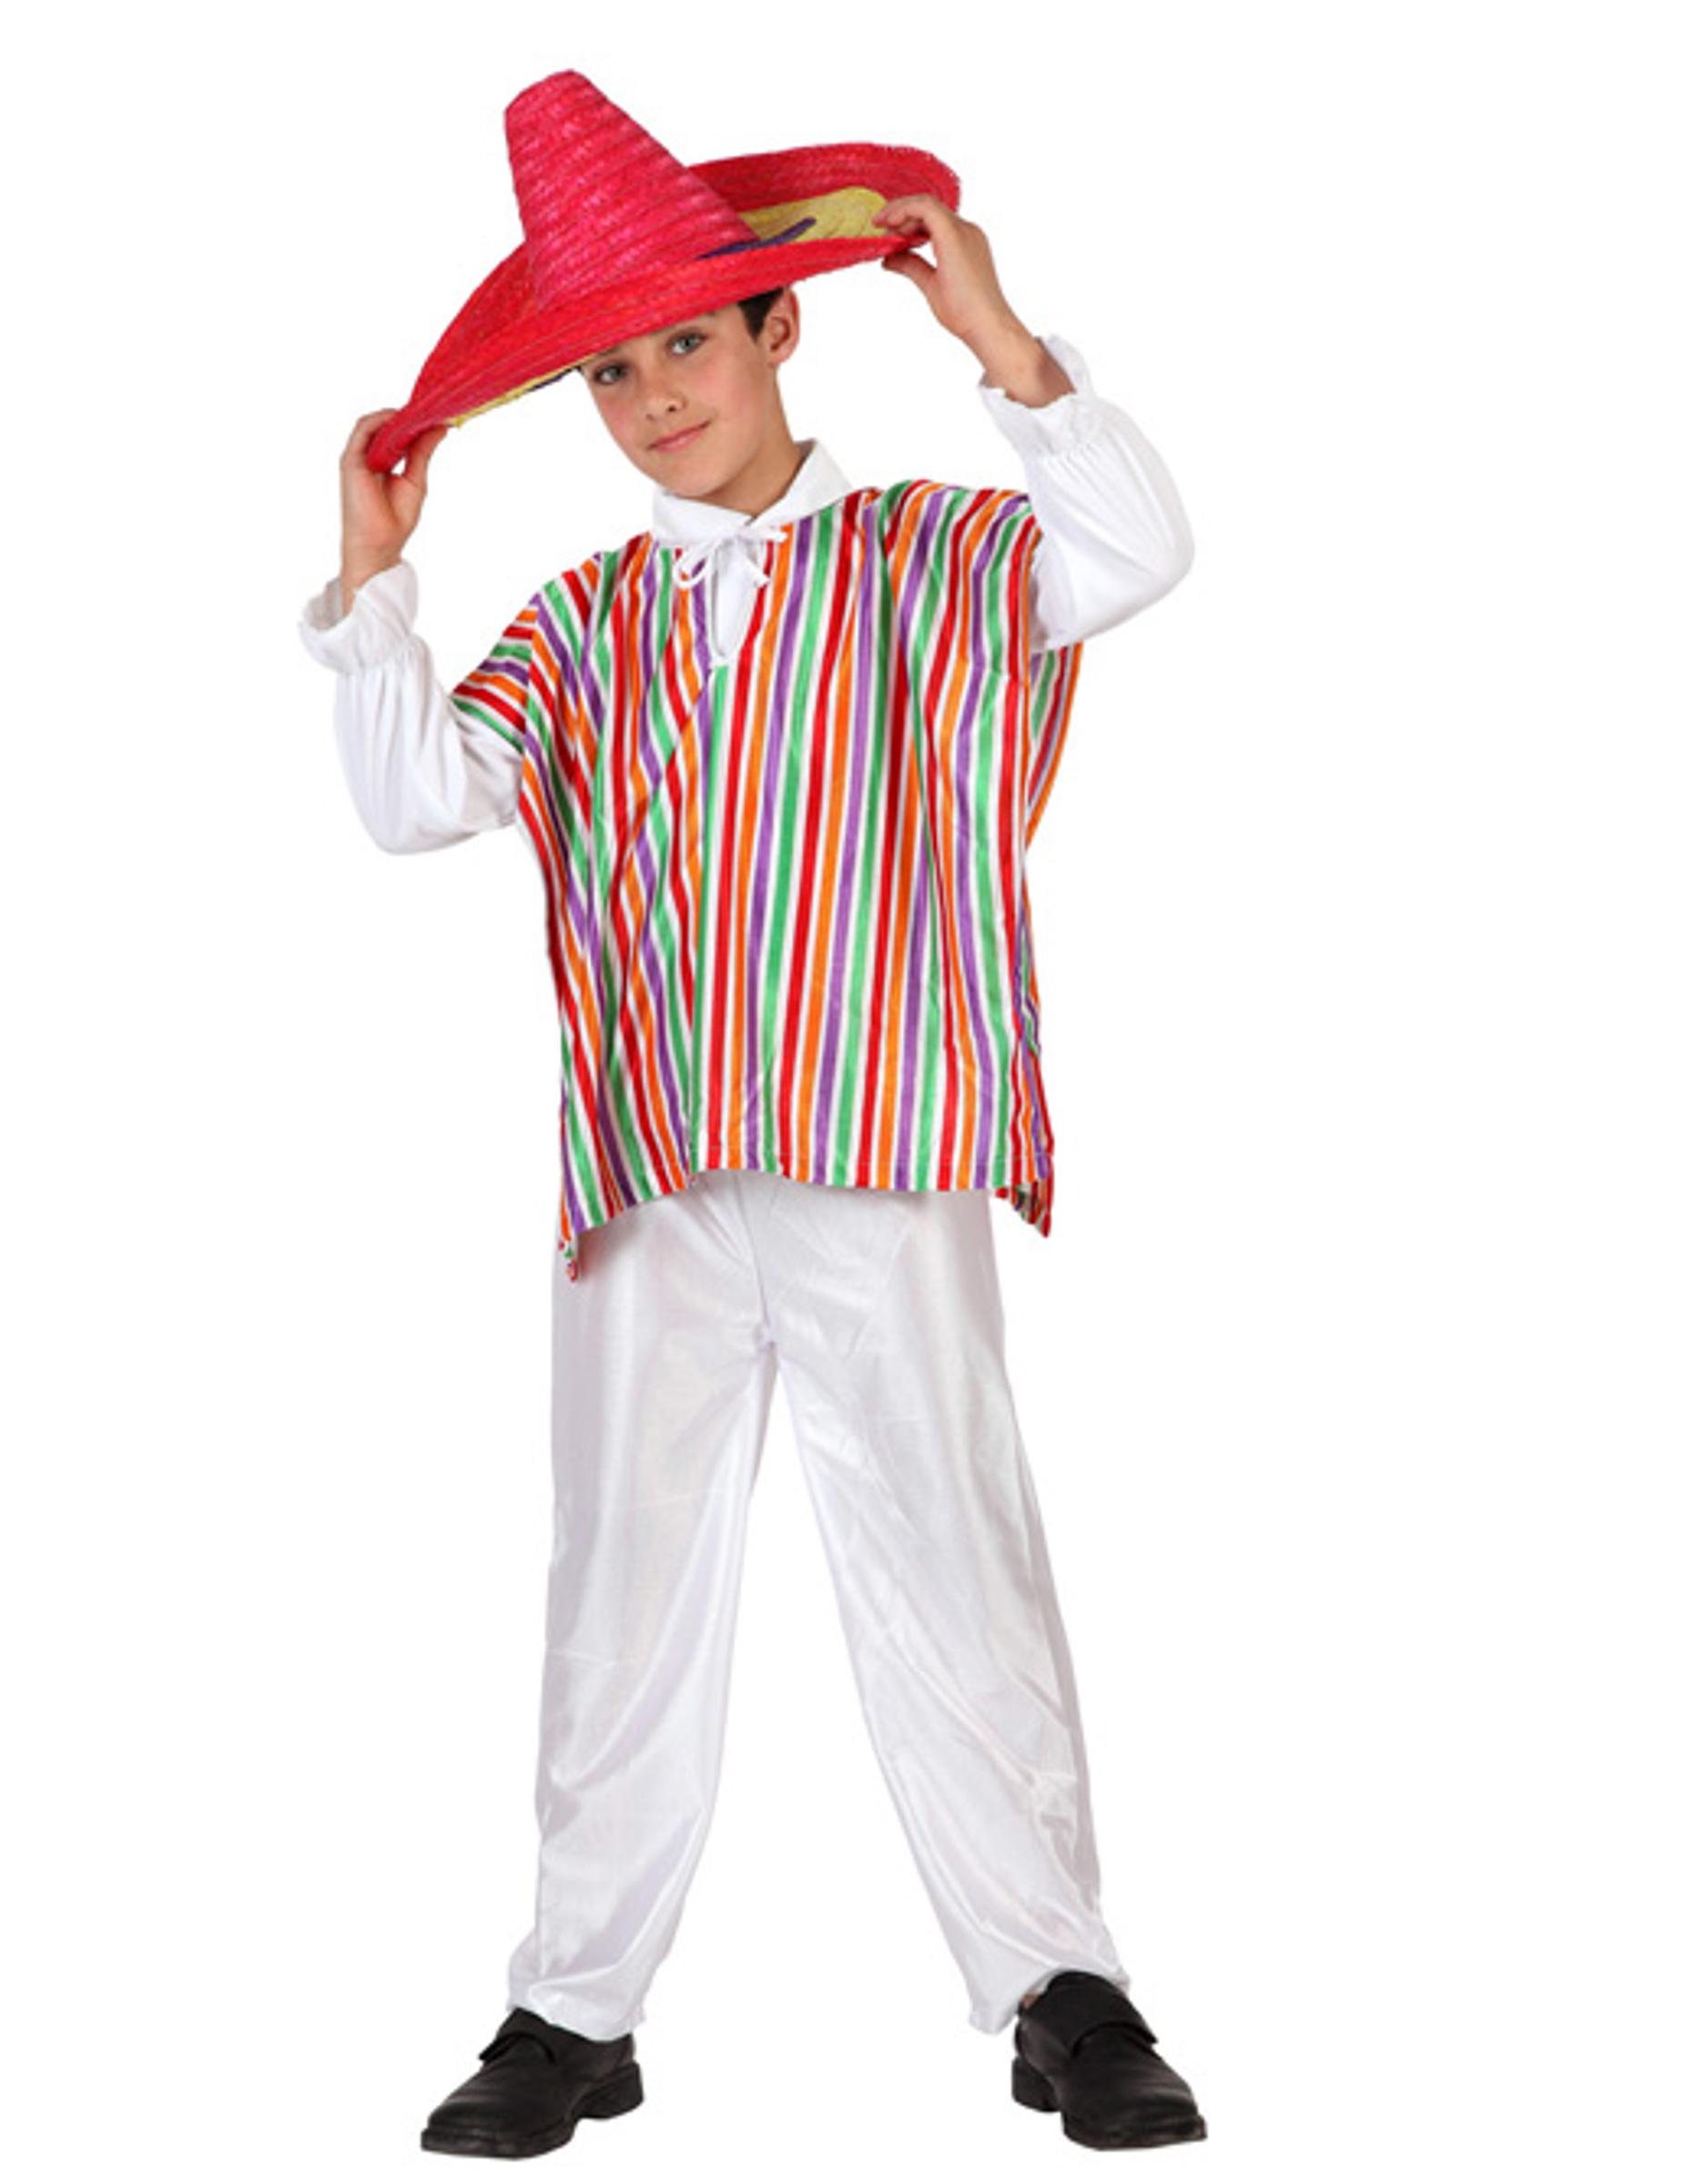 Costume messicano Bambino  Costumi bambini 6d6c6ef2d279